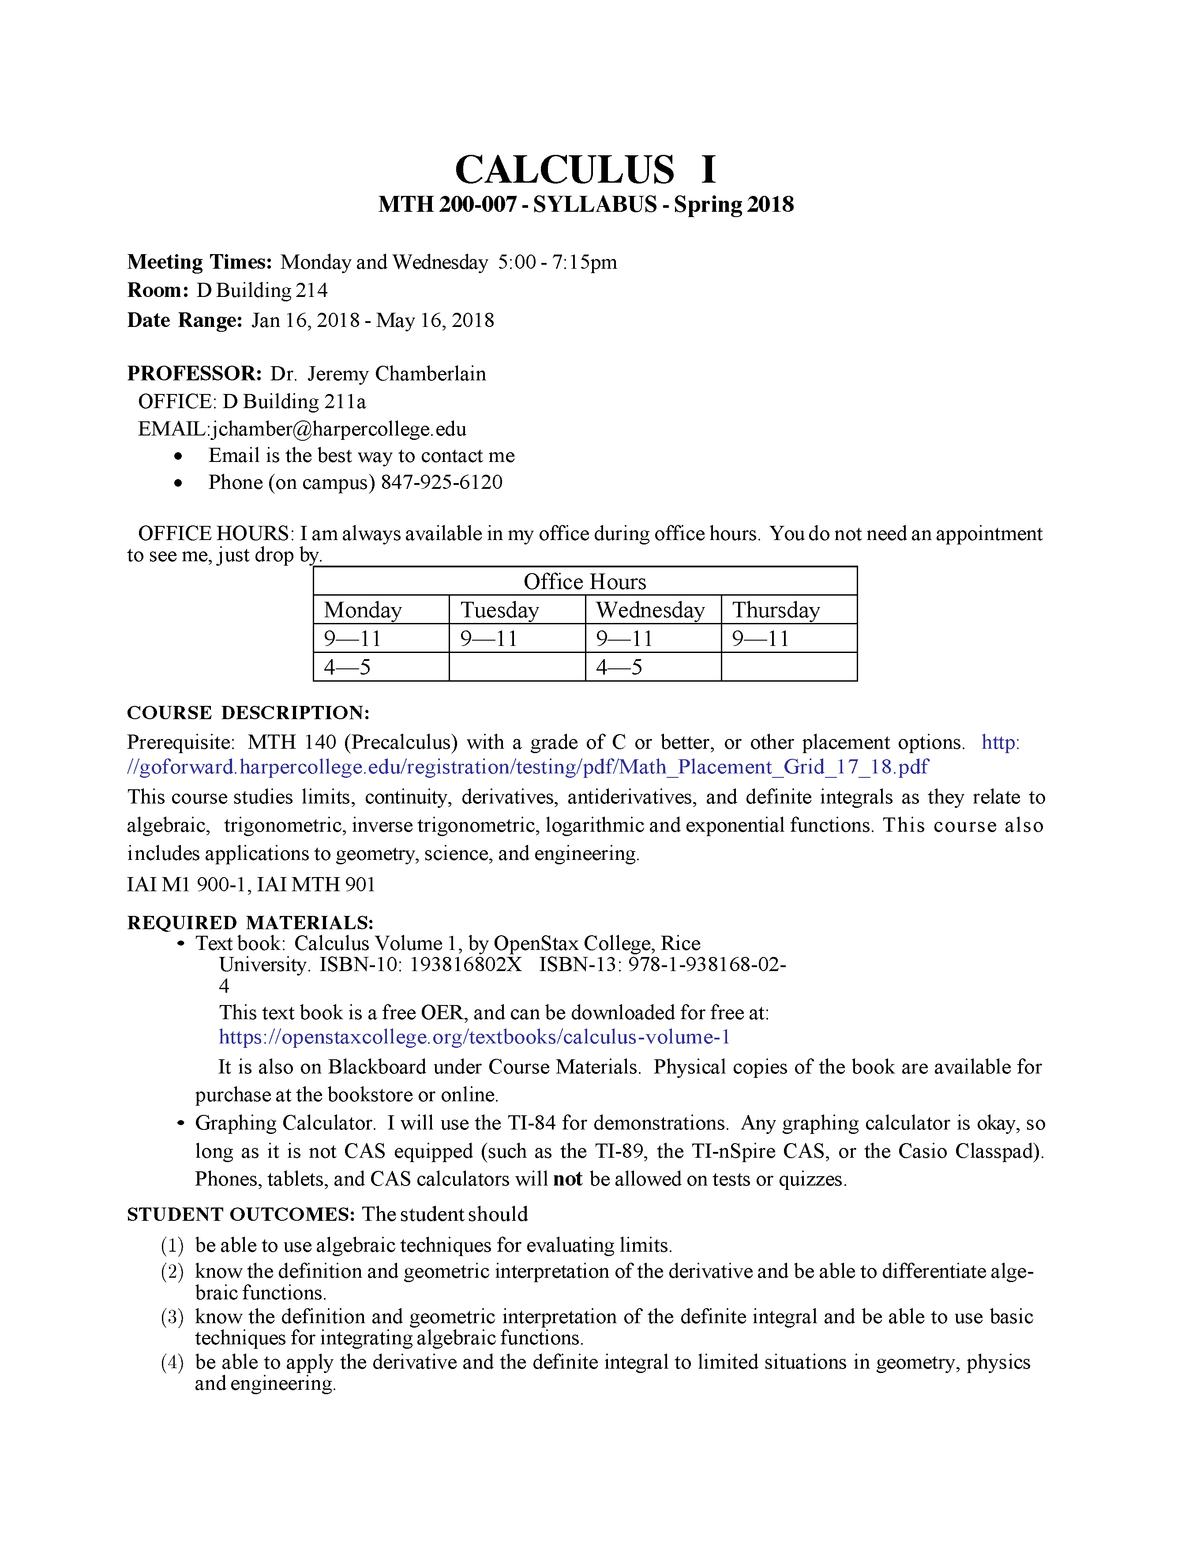 MTH 200 007 Syllabus Spring 18 - PHY 201 - StuDocu